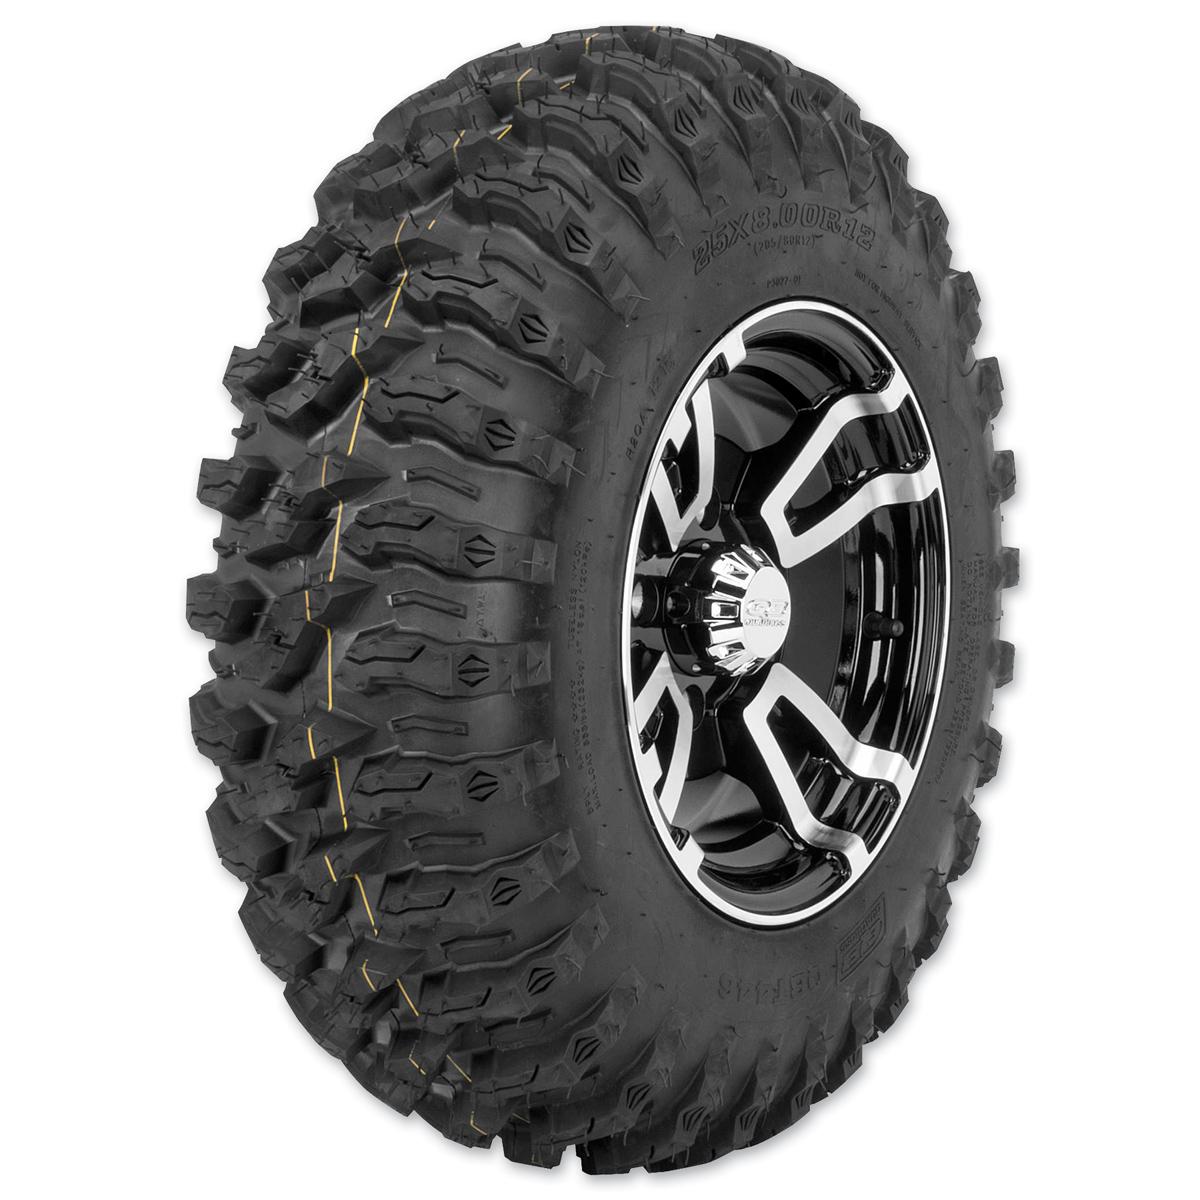 Quadboss QBT446 25X8R12 8-Ply Front Tire